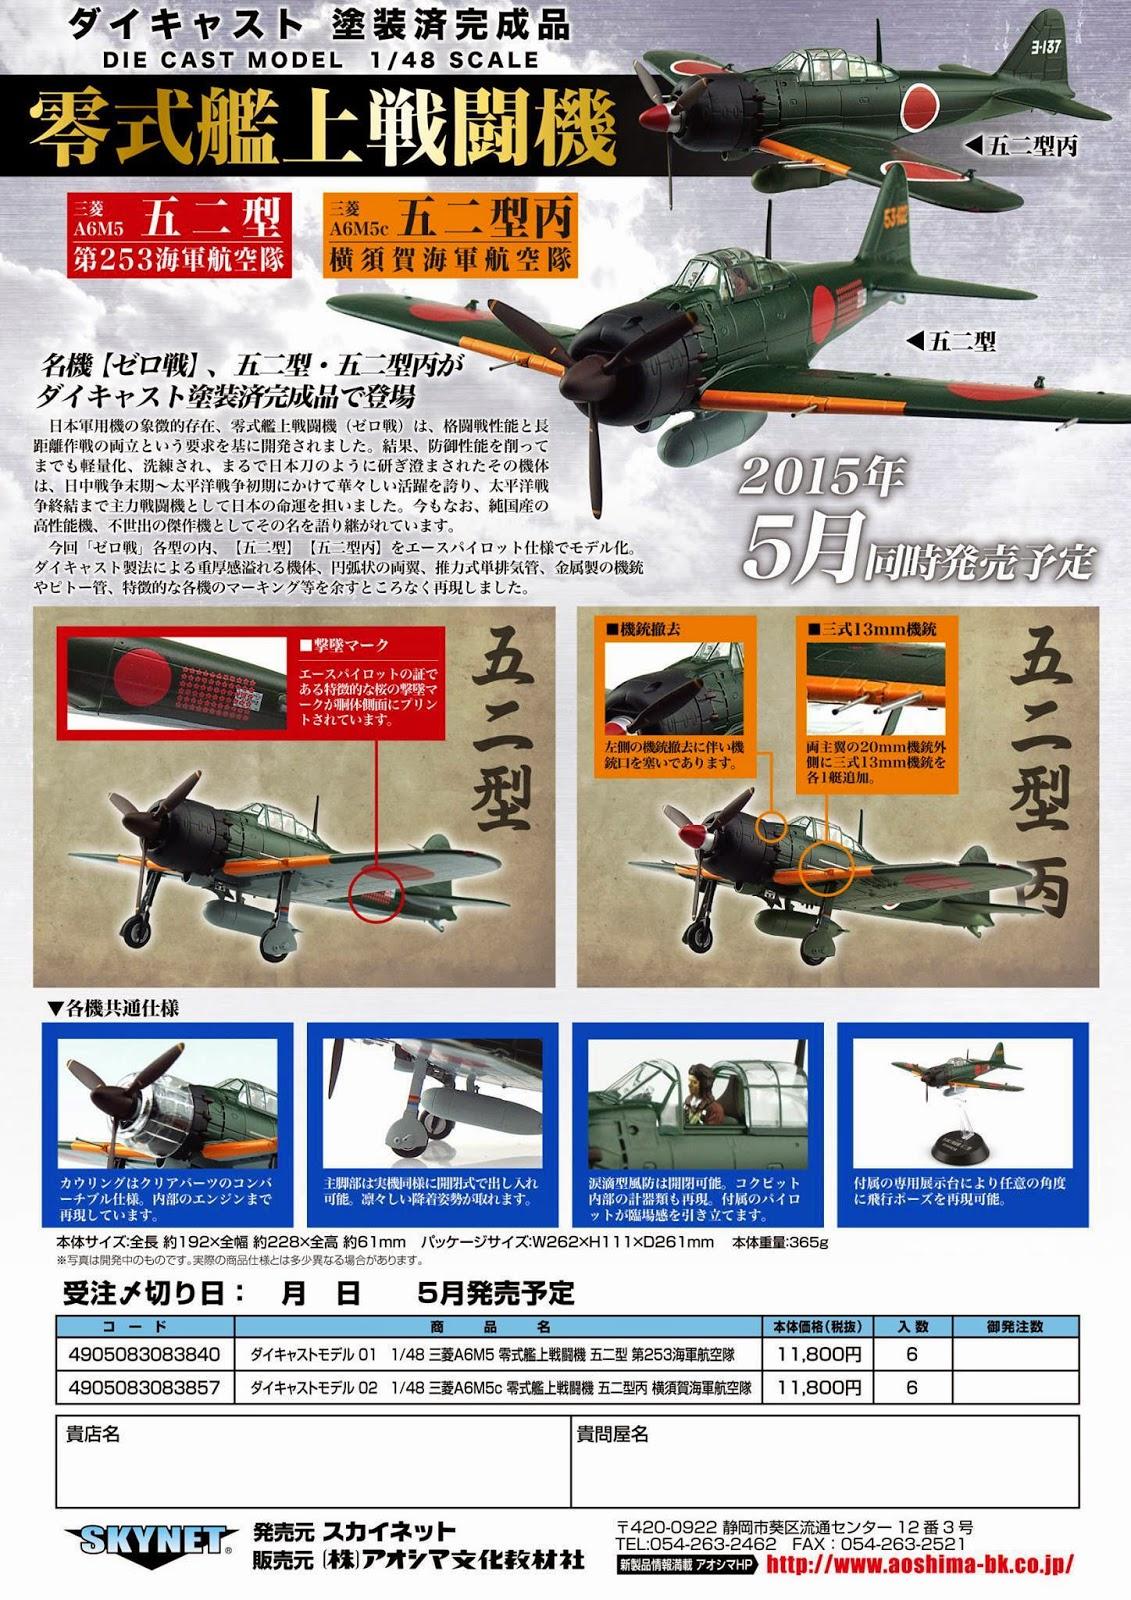 Hobby Model Ent : Aoshima/Skynet : Die Cast 1/48 Scale A6M5